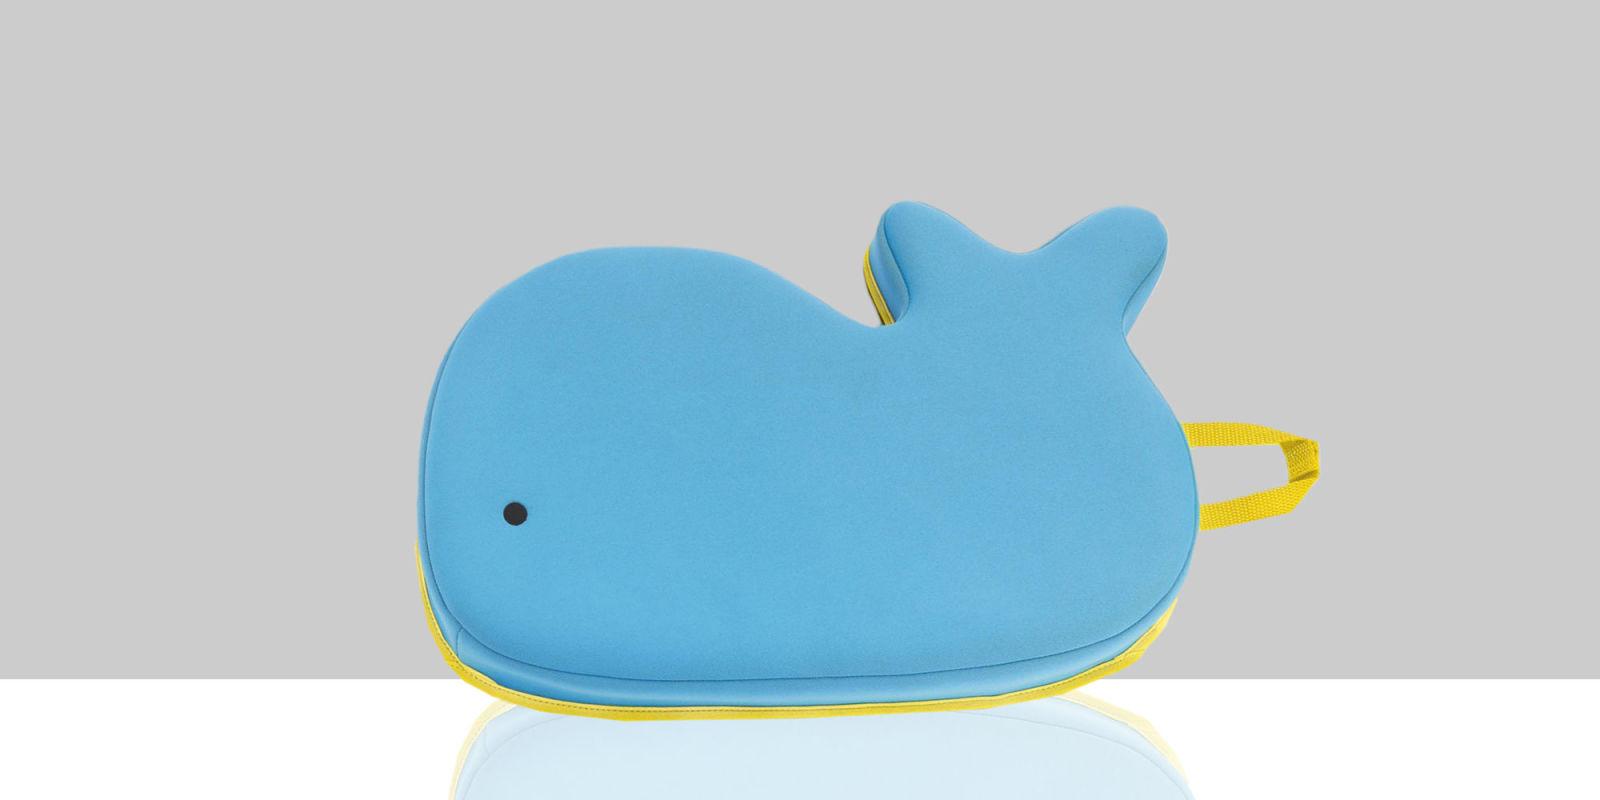 Baby Bathroom Accessories - Whale bath kneeler